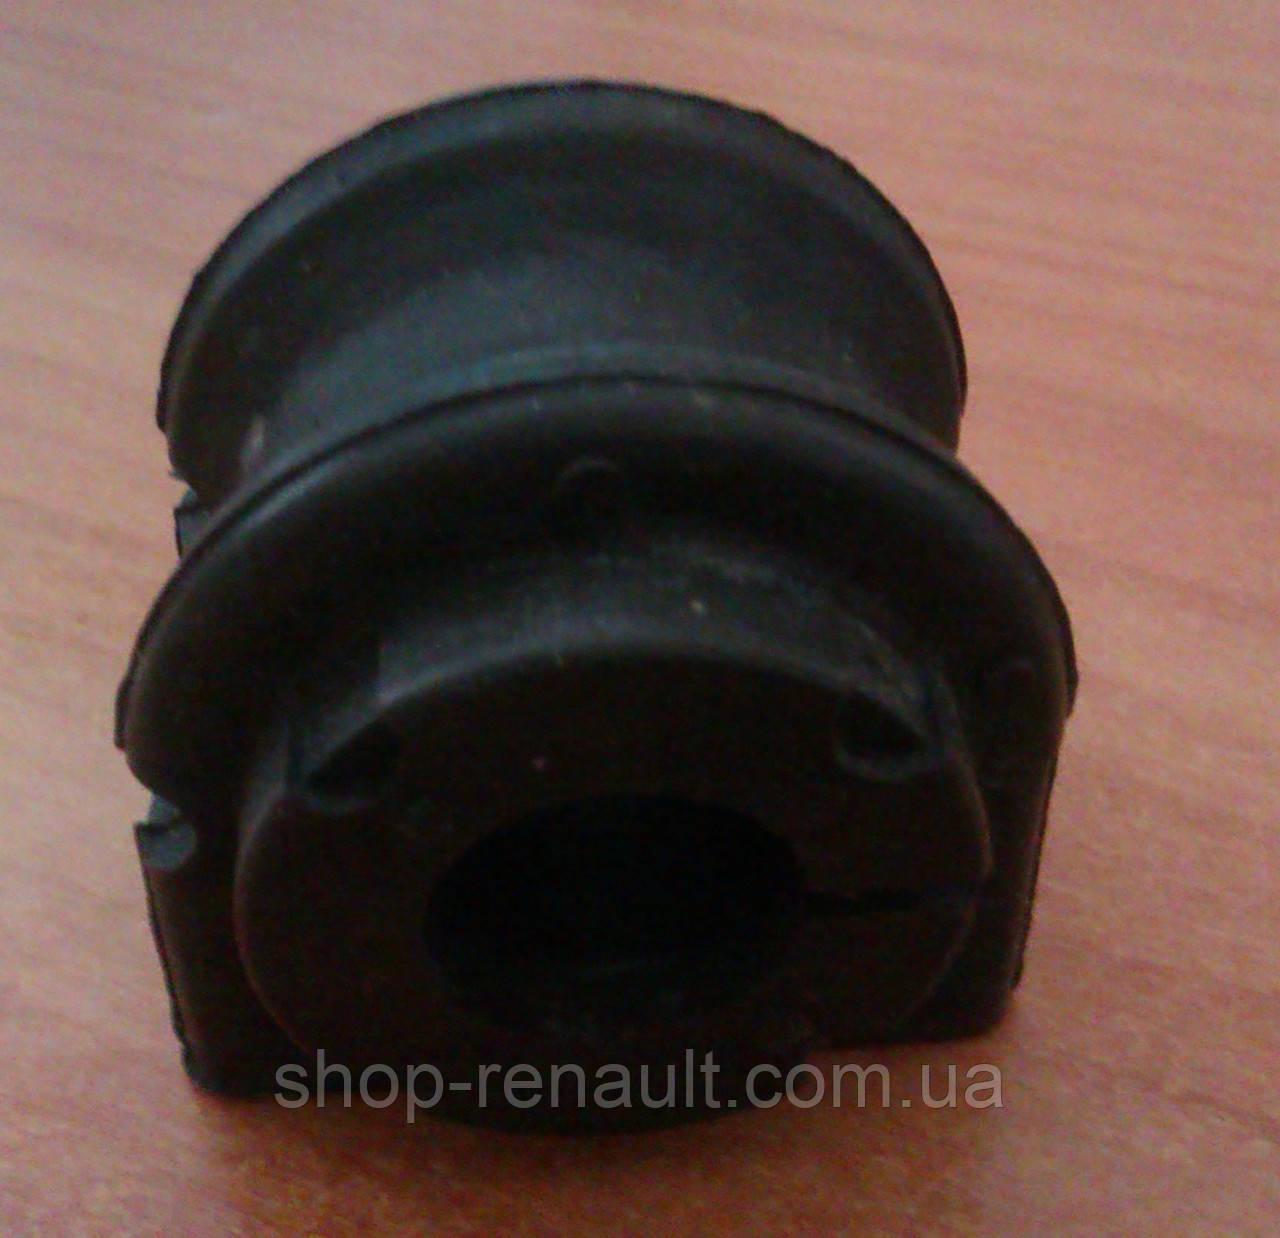 Подушка (втулка) переднего стабилизатора Kangoo II BC1217 BC GUMA